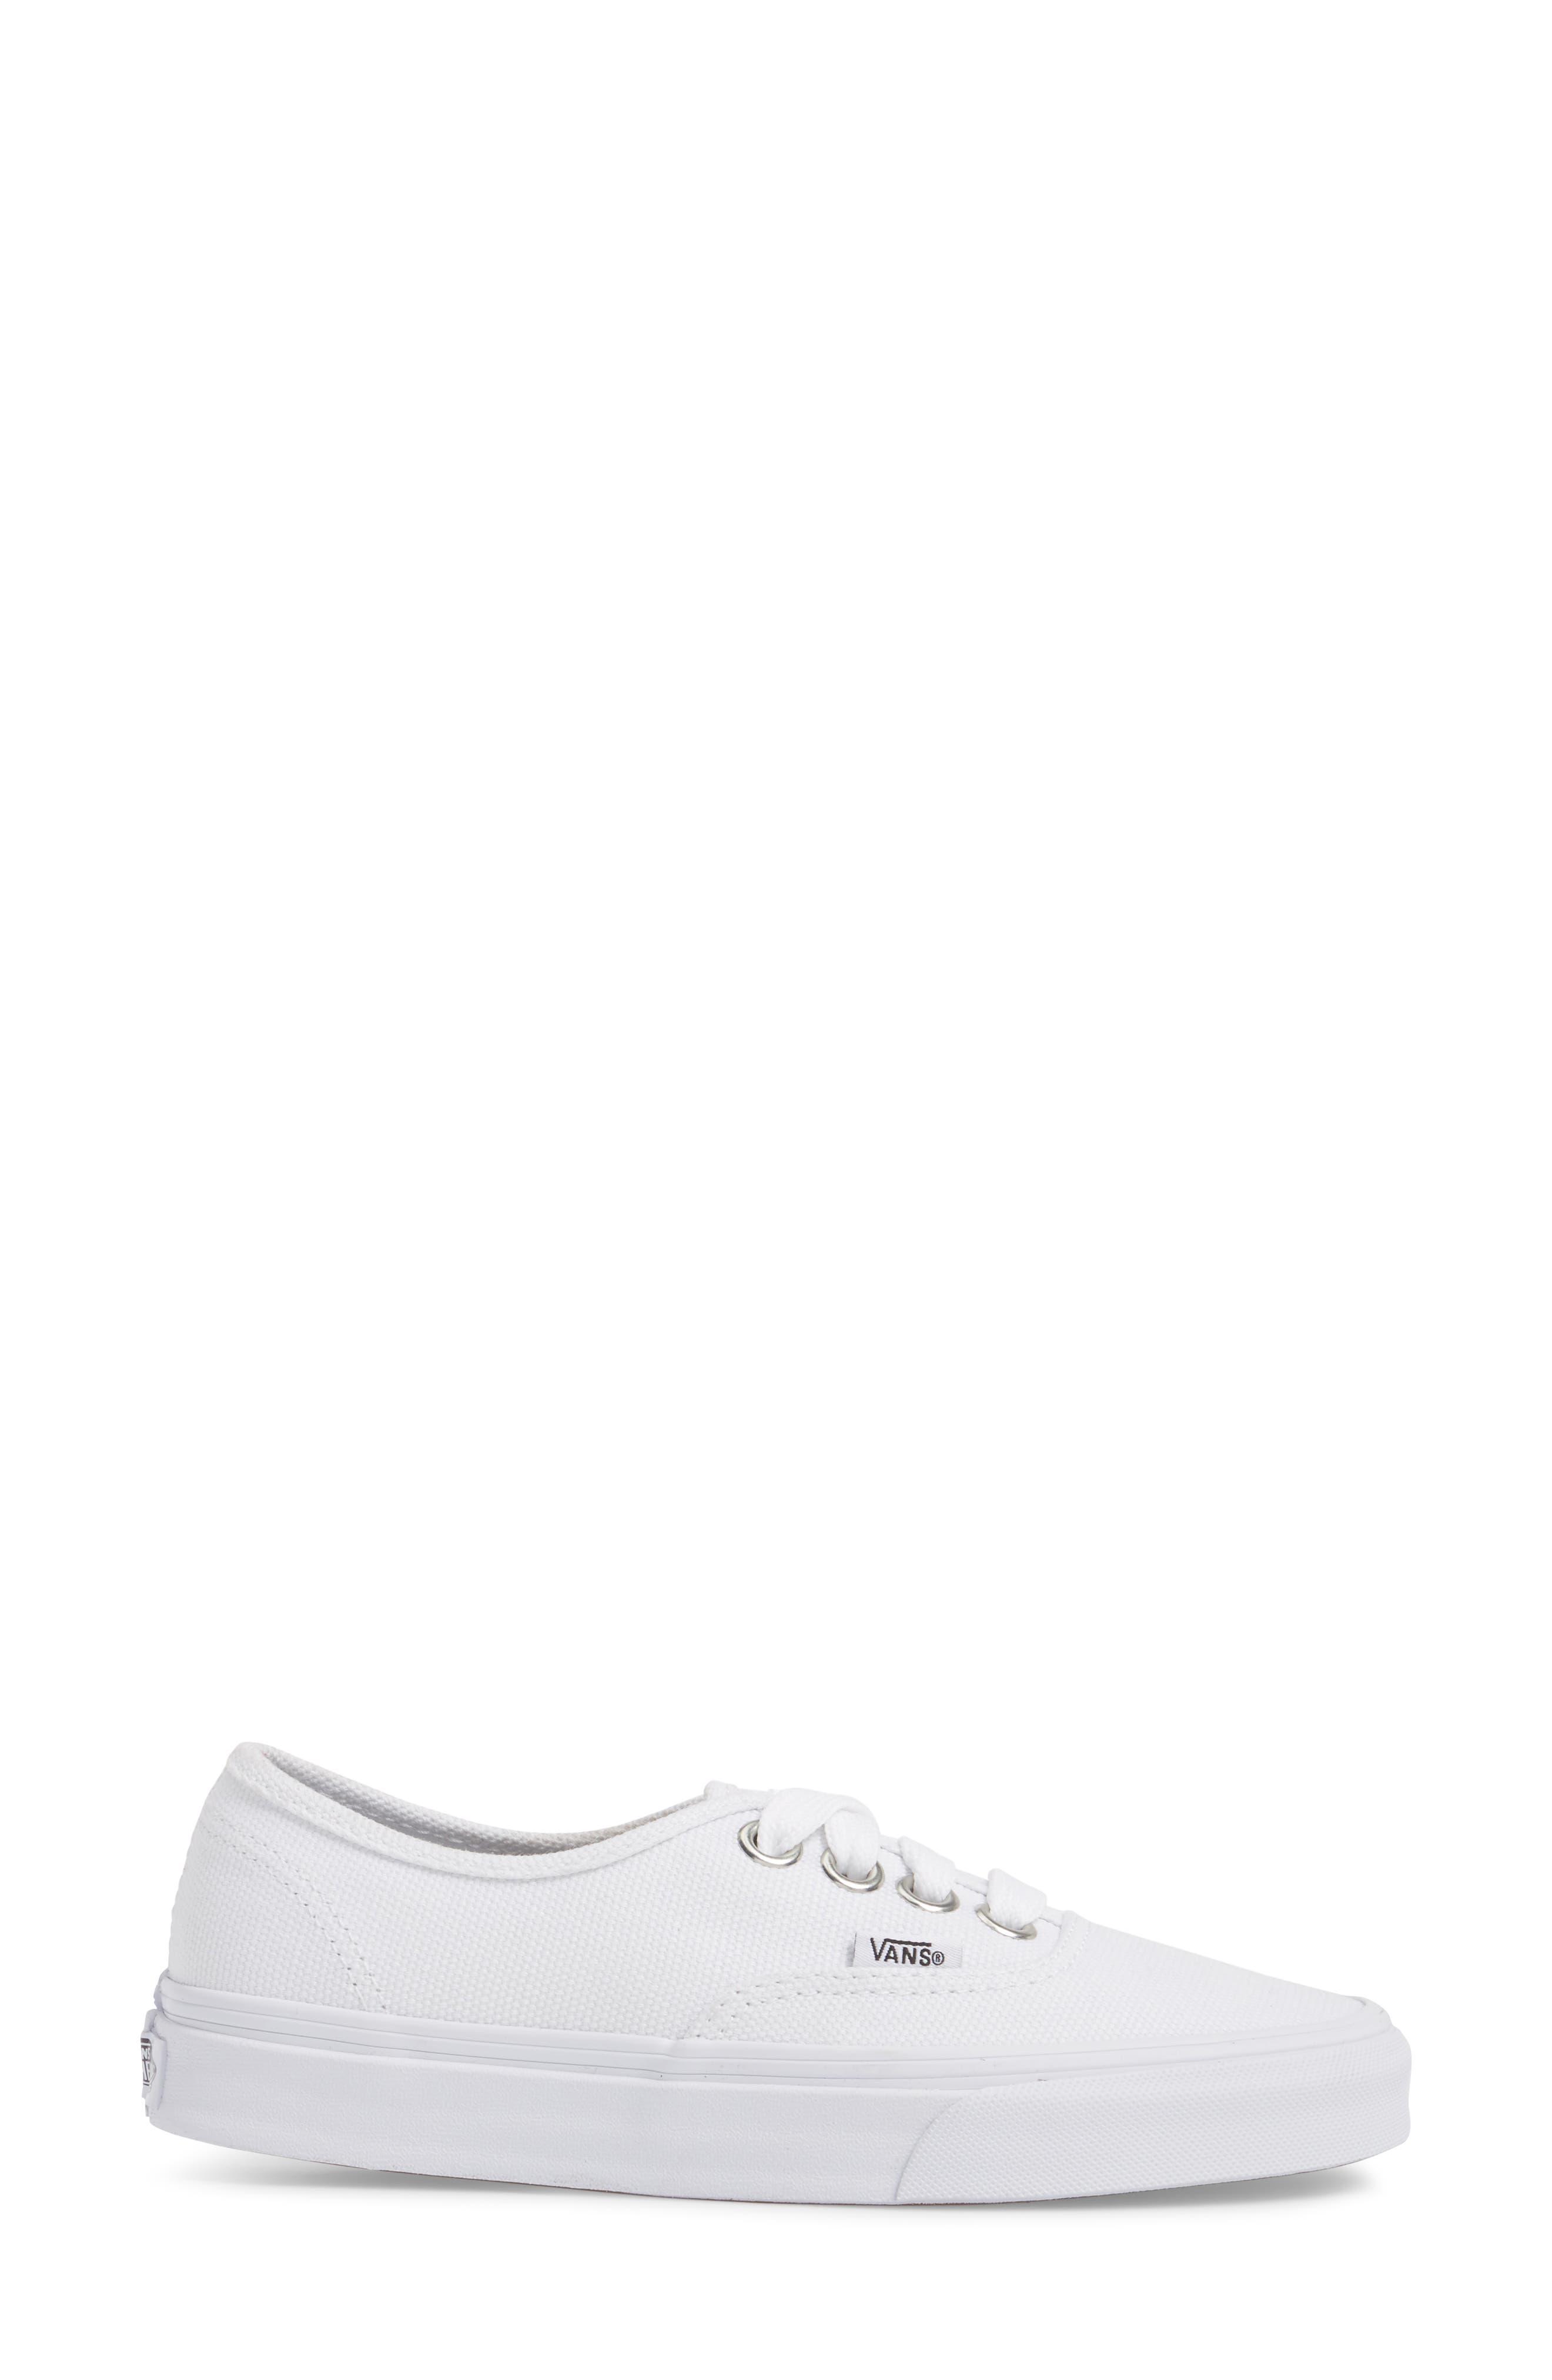 ,                             'Authentic' Sneaker,                             Alternate thumbnail 194, color,                             102